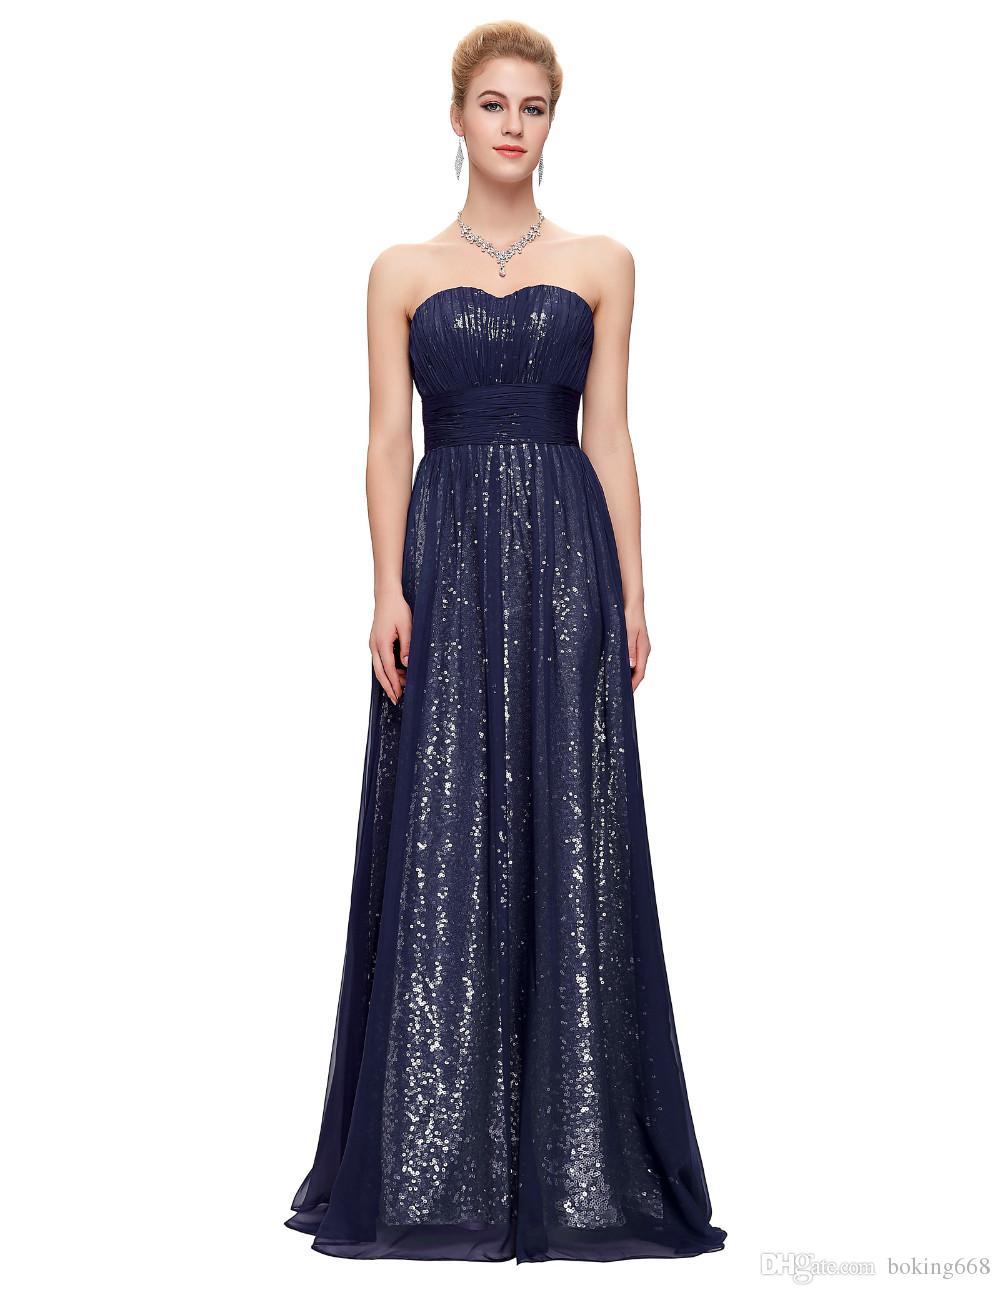 Sequins Formal Elegant Prom Dresses 2018 High Quality Junior ...